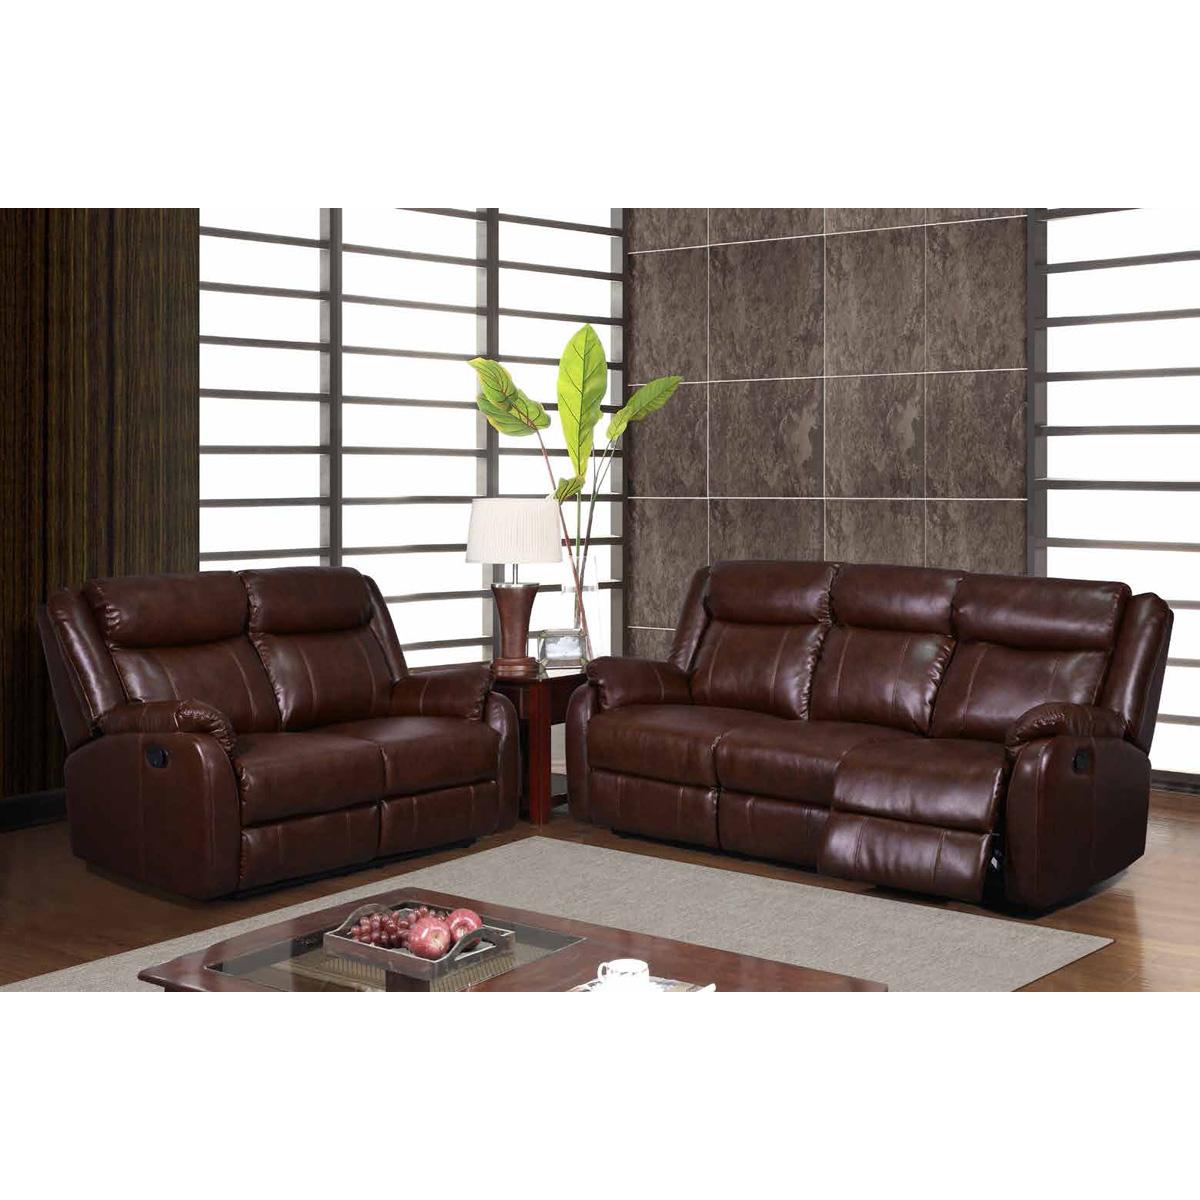 Brown Leather Recliner Sofa Set: Nolan Reclining Sofa Set, Brown Leather